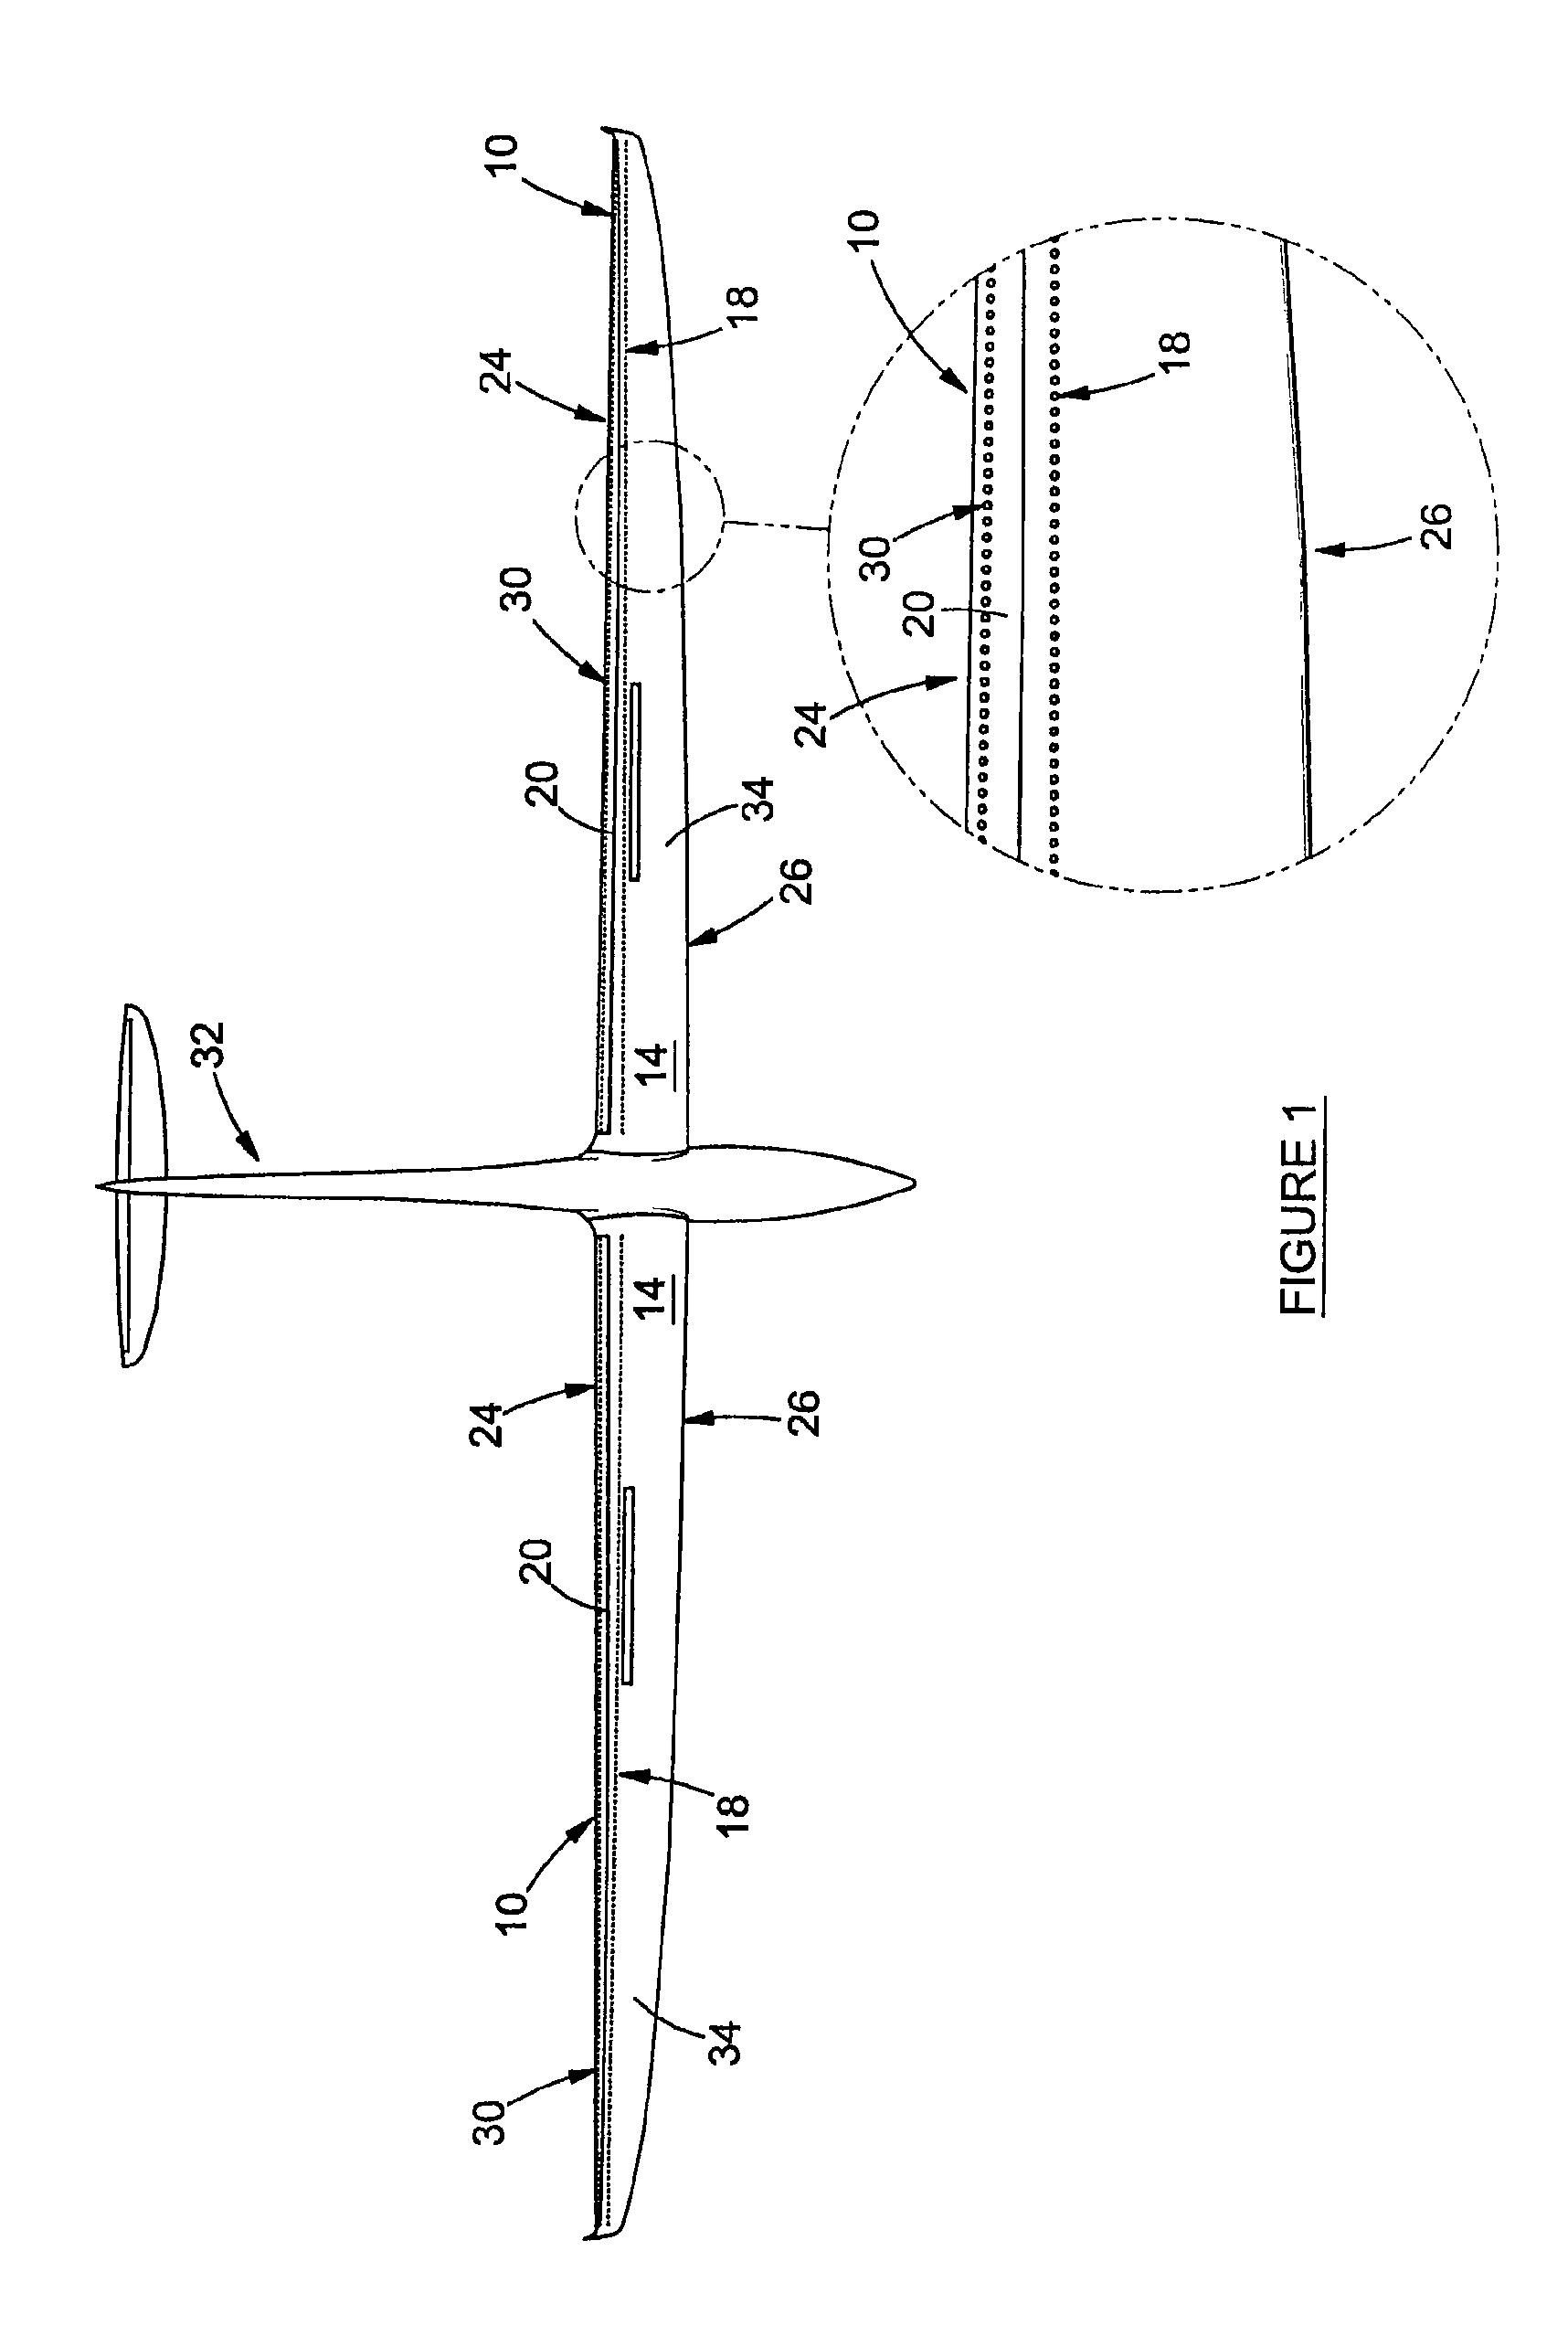 patente us8251319